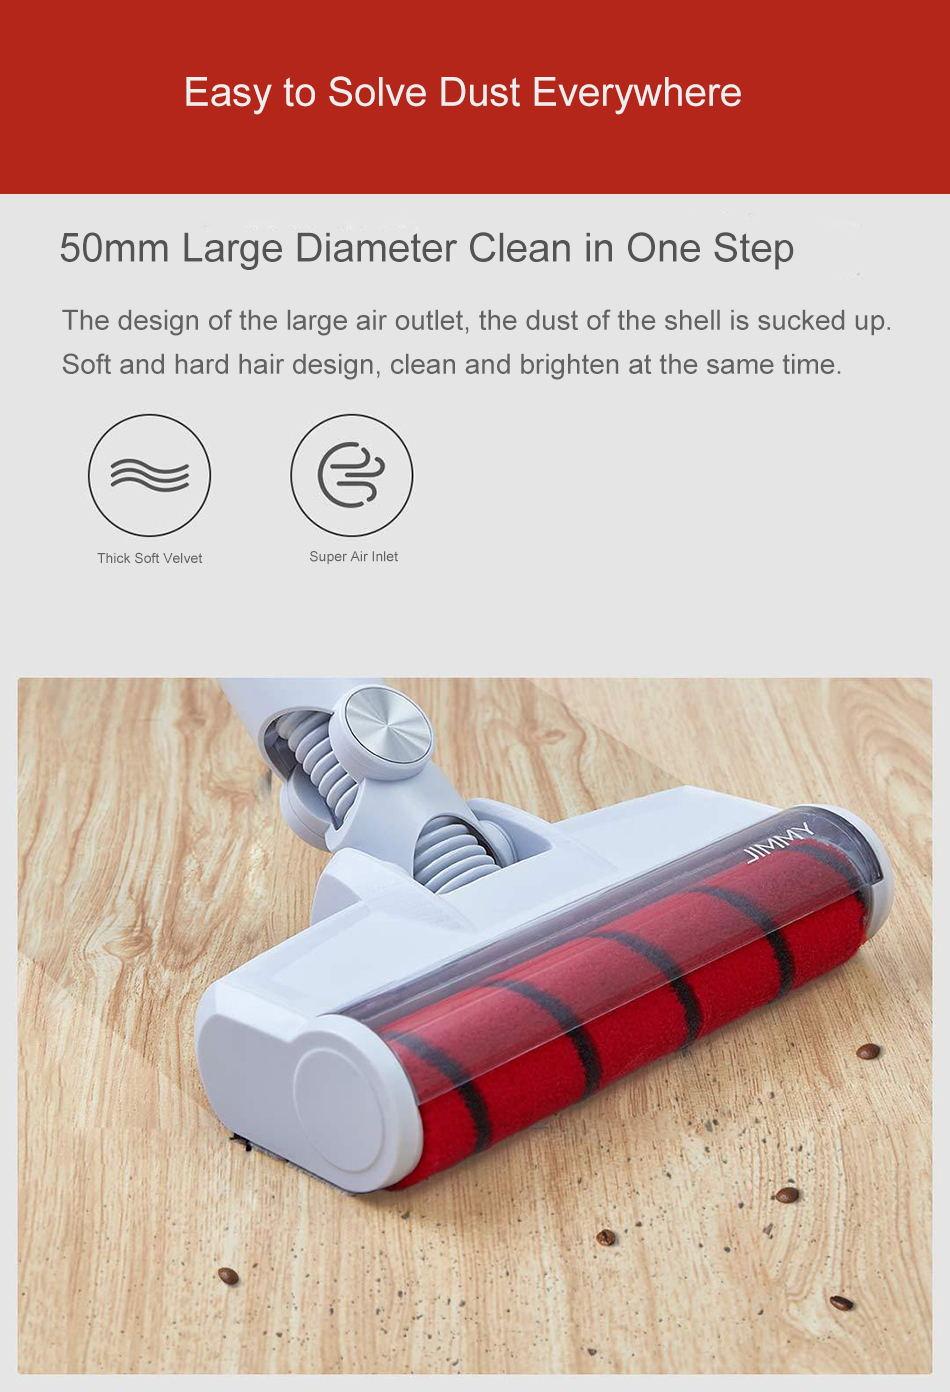 new jimmy jv51 handheld wireless vacuum cleaner